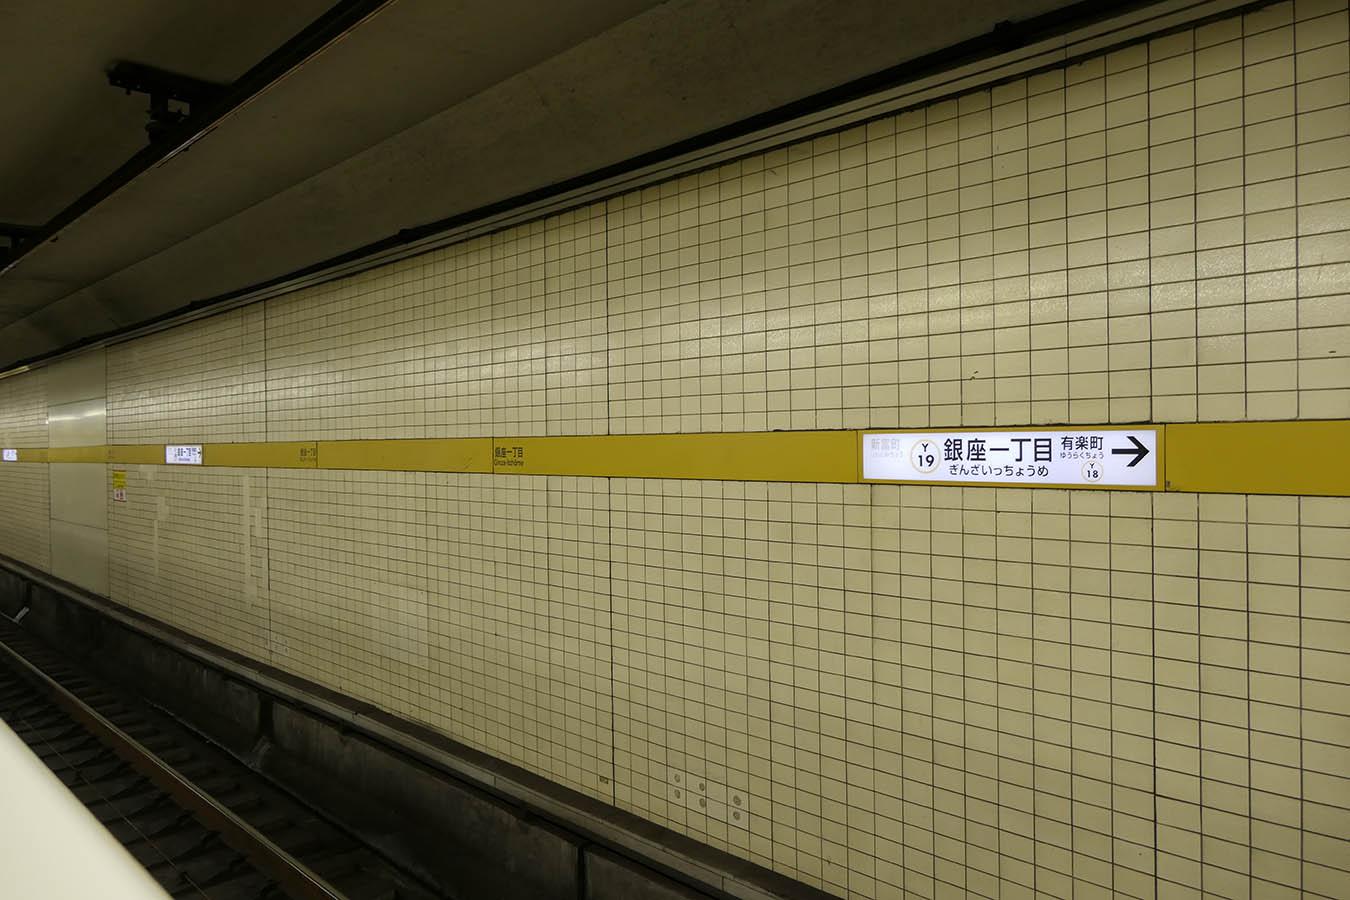 Y19_photo01.jpg